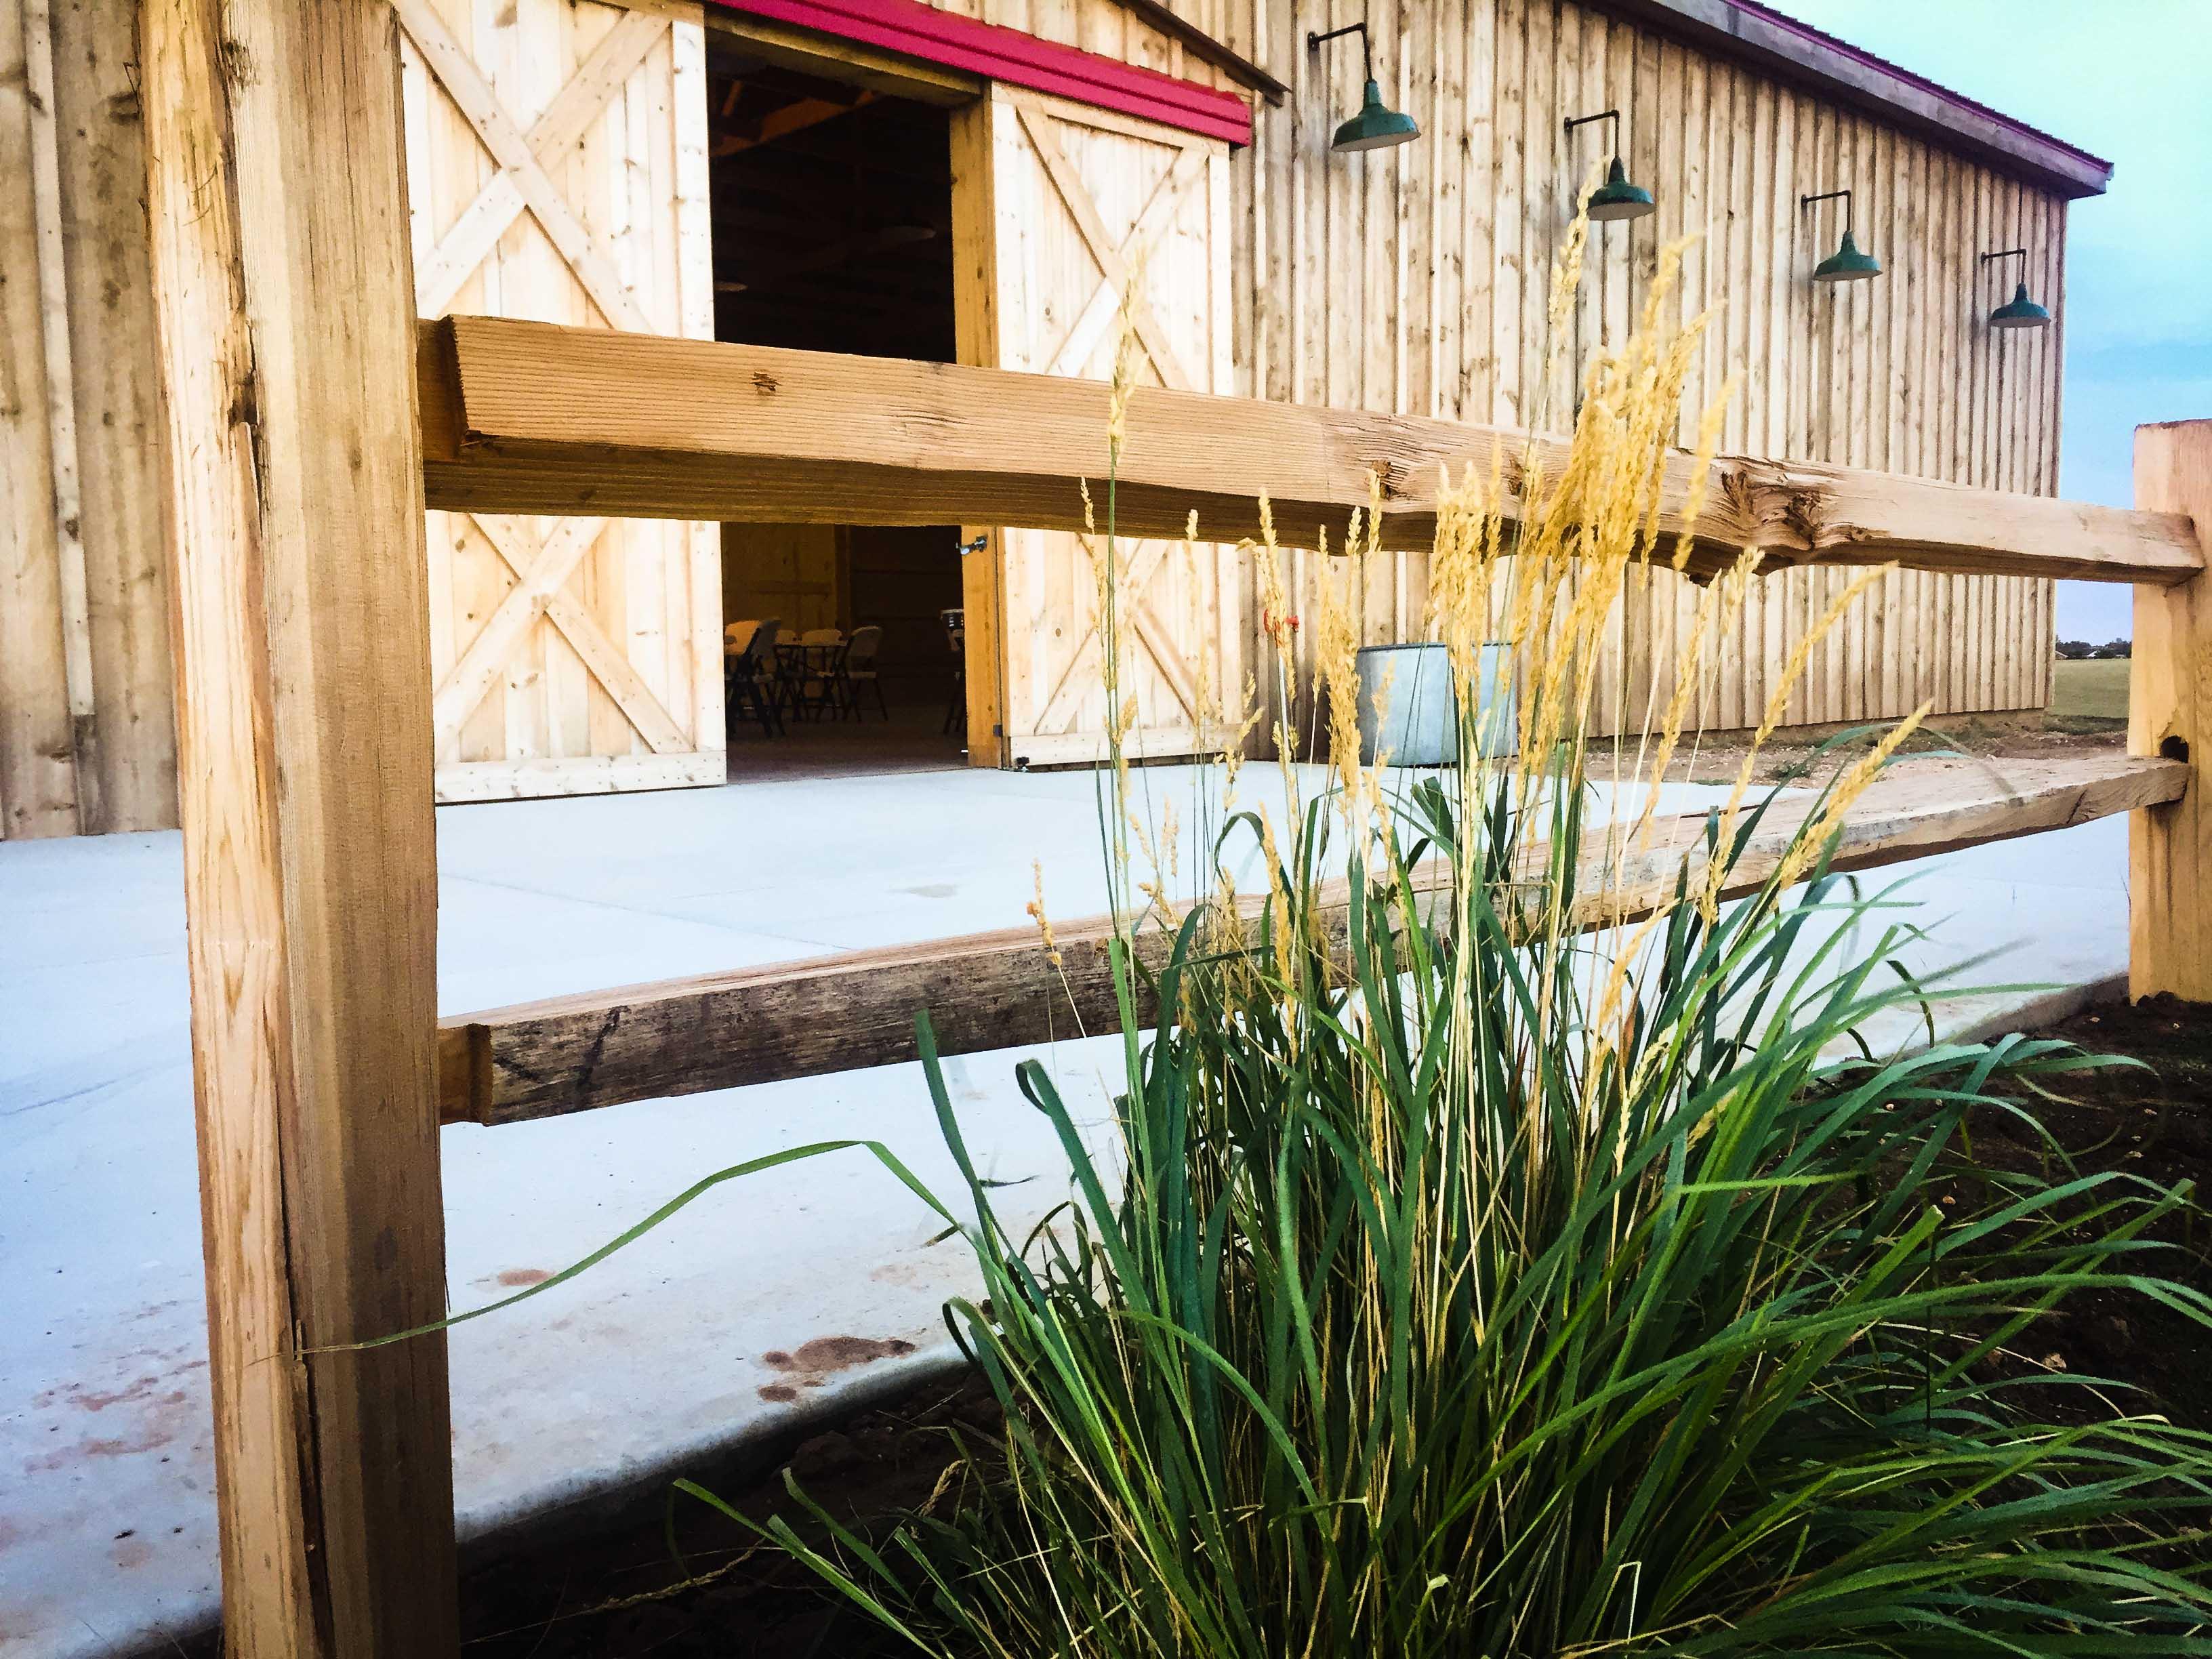 Barn Doors and Grass